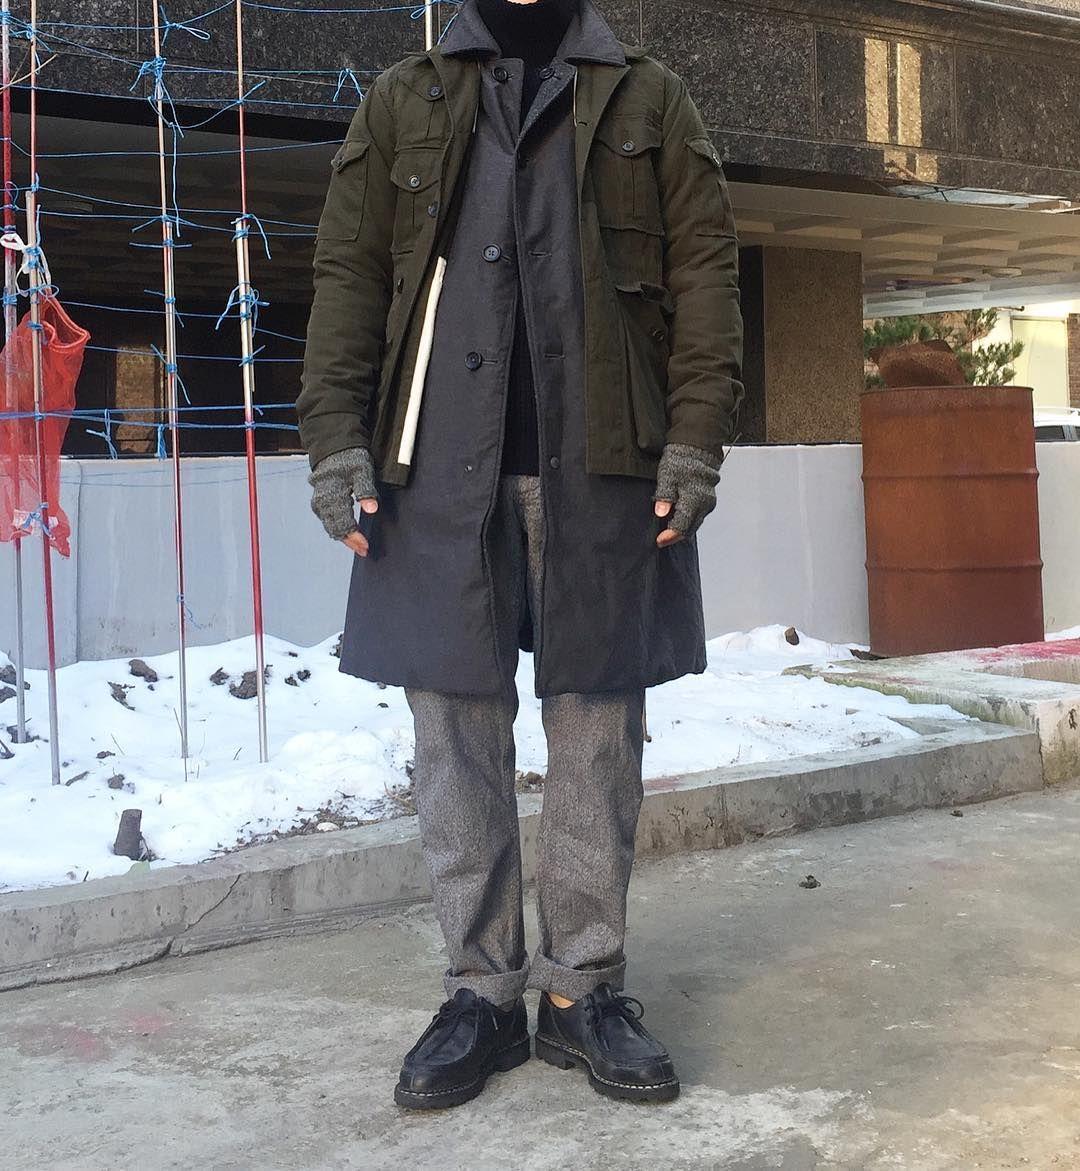 "Reposting @iam_nurimon: ... ""- #engineeredgarments #barbour  생각대로 되지않아 조금 속상해.. 근데 아무렇지도 않아서 조금 신기해 나도 도가 텄나봐.."" Menswear mode style fashion outfit ootd homme"